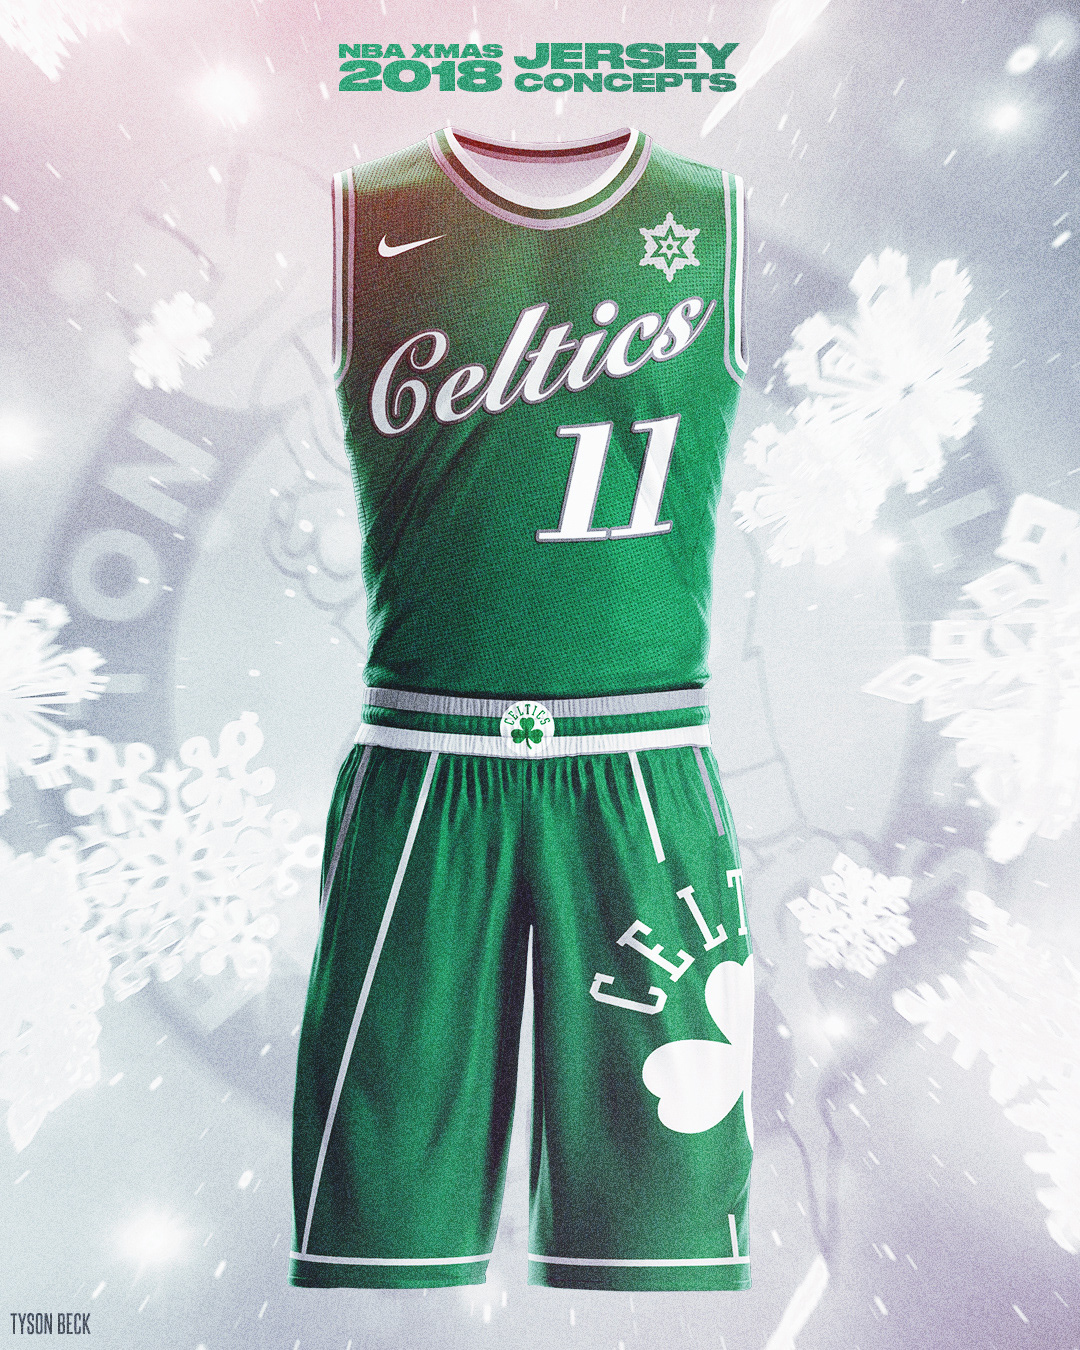 premium selection 40637 f35a7 boston celtics christmas jersey 2019